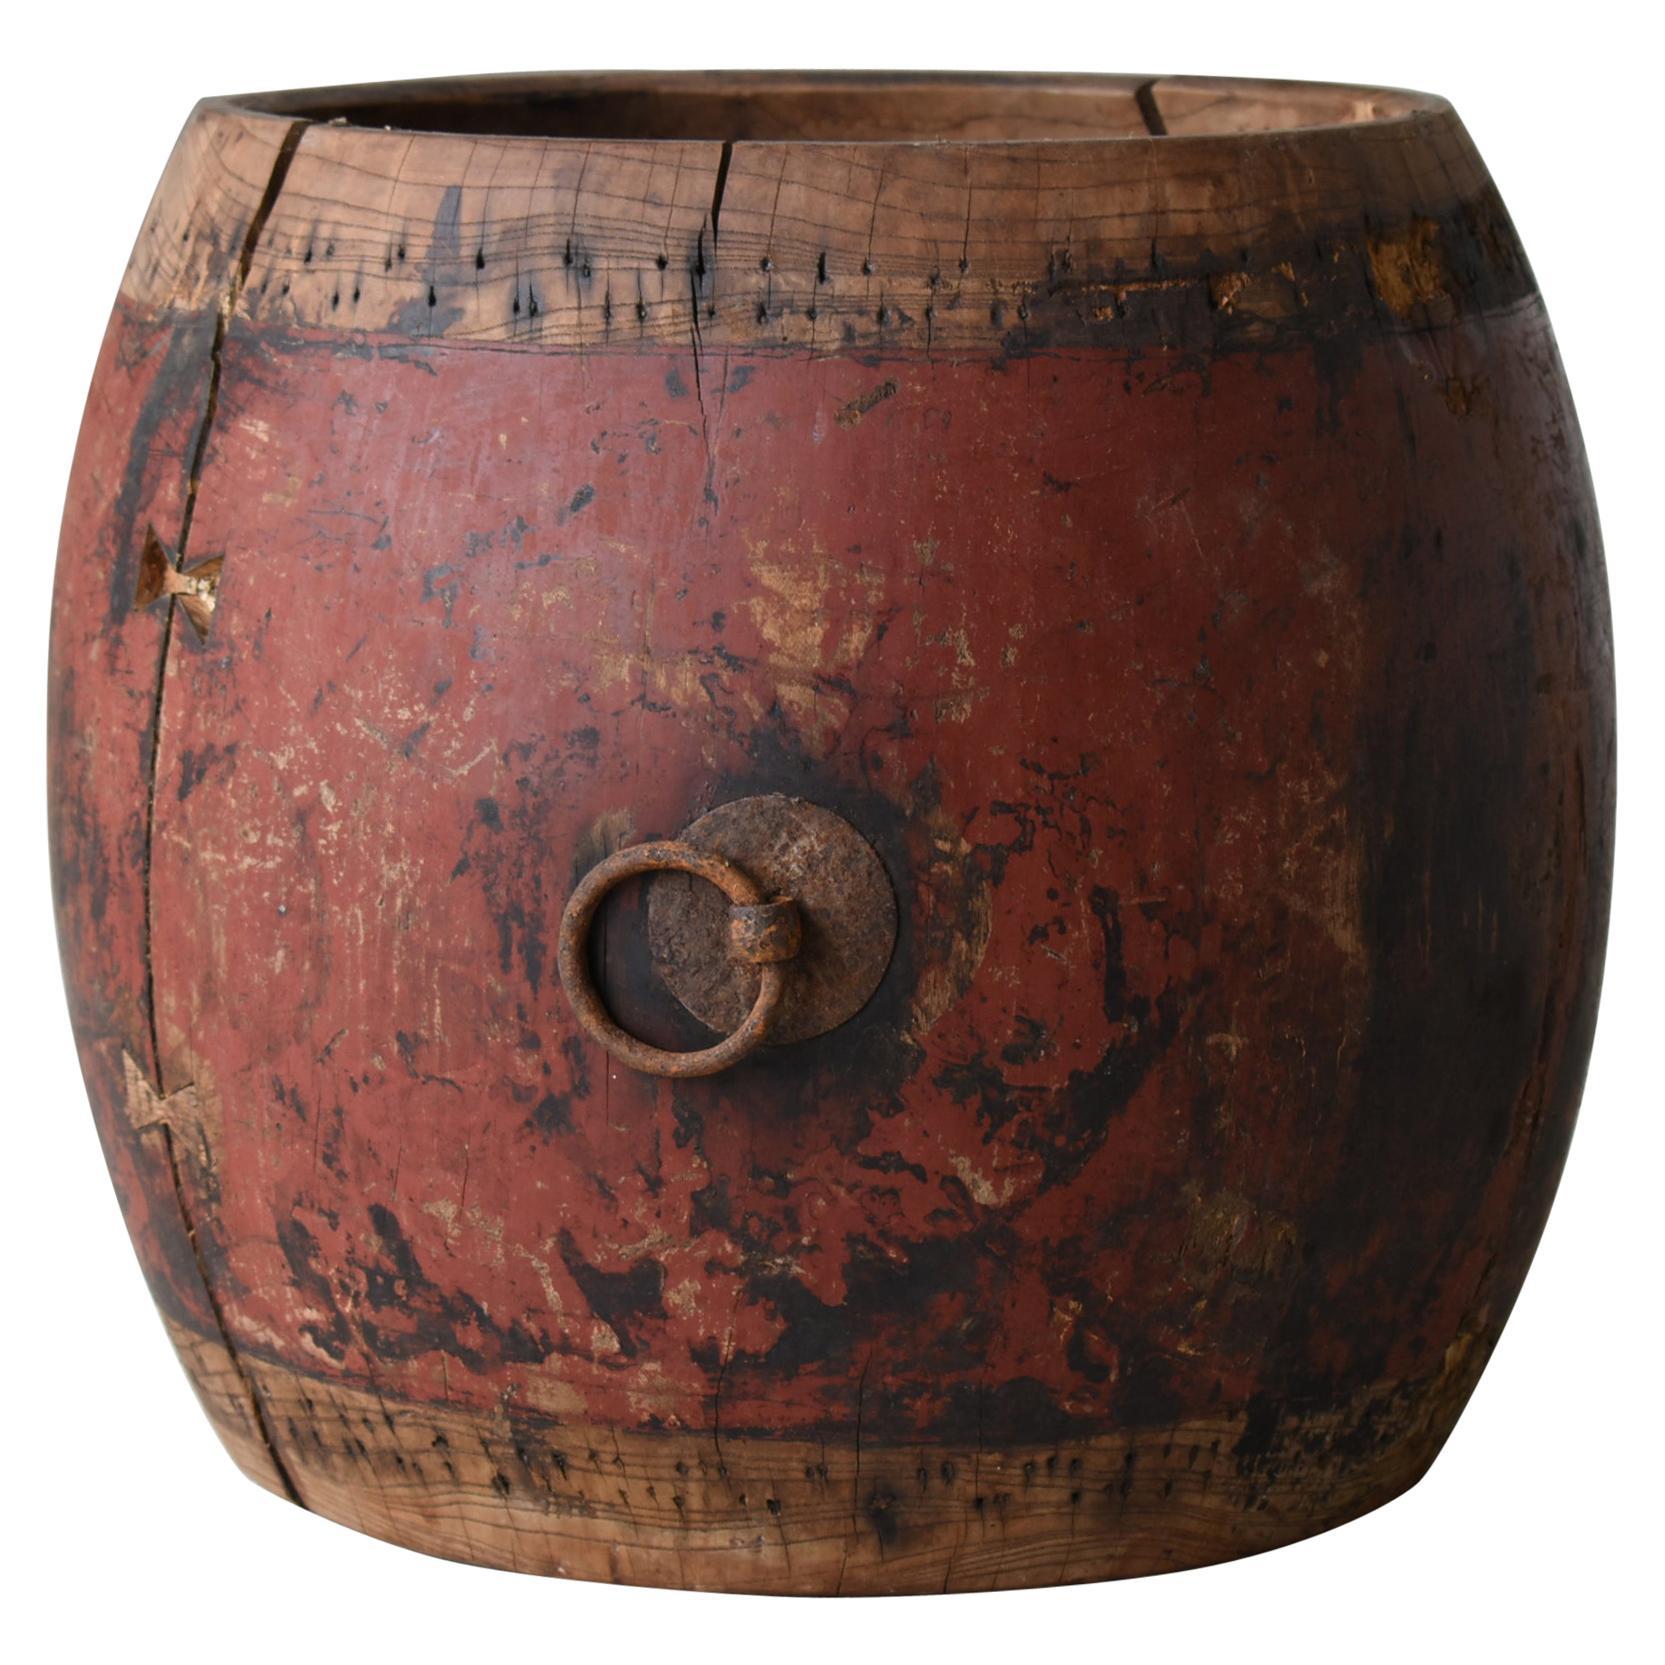 Japanese Antique Drum 1750s-1860s/Plant Cover Wabisabi Art Flower Vase